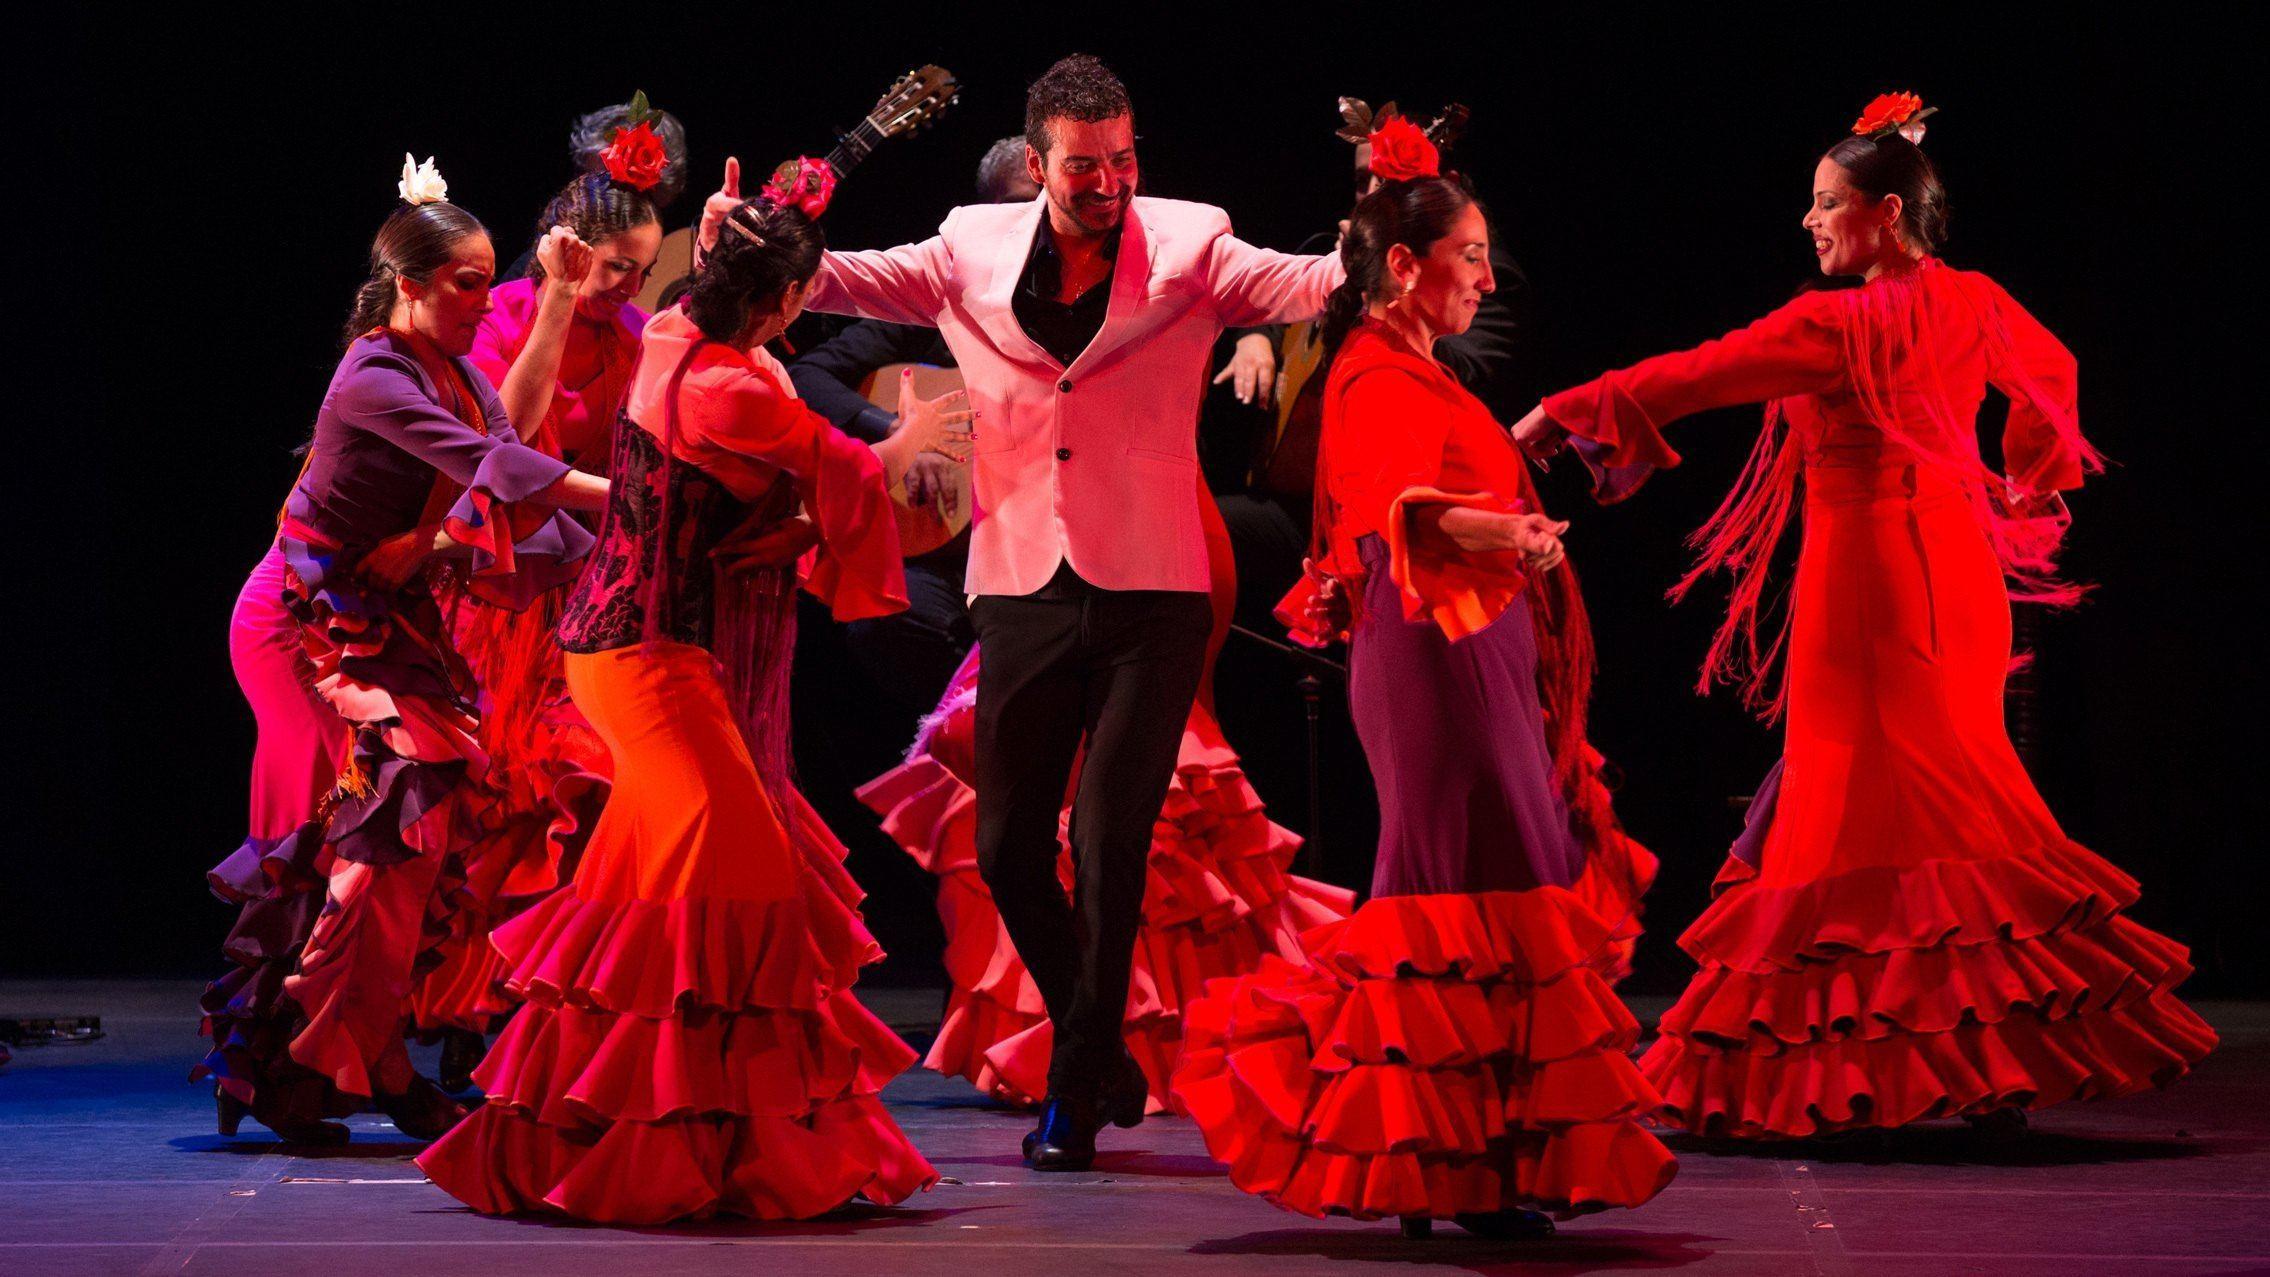 juan siddi flamenco santa fe at jacob u0027s pillow 2016